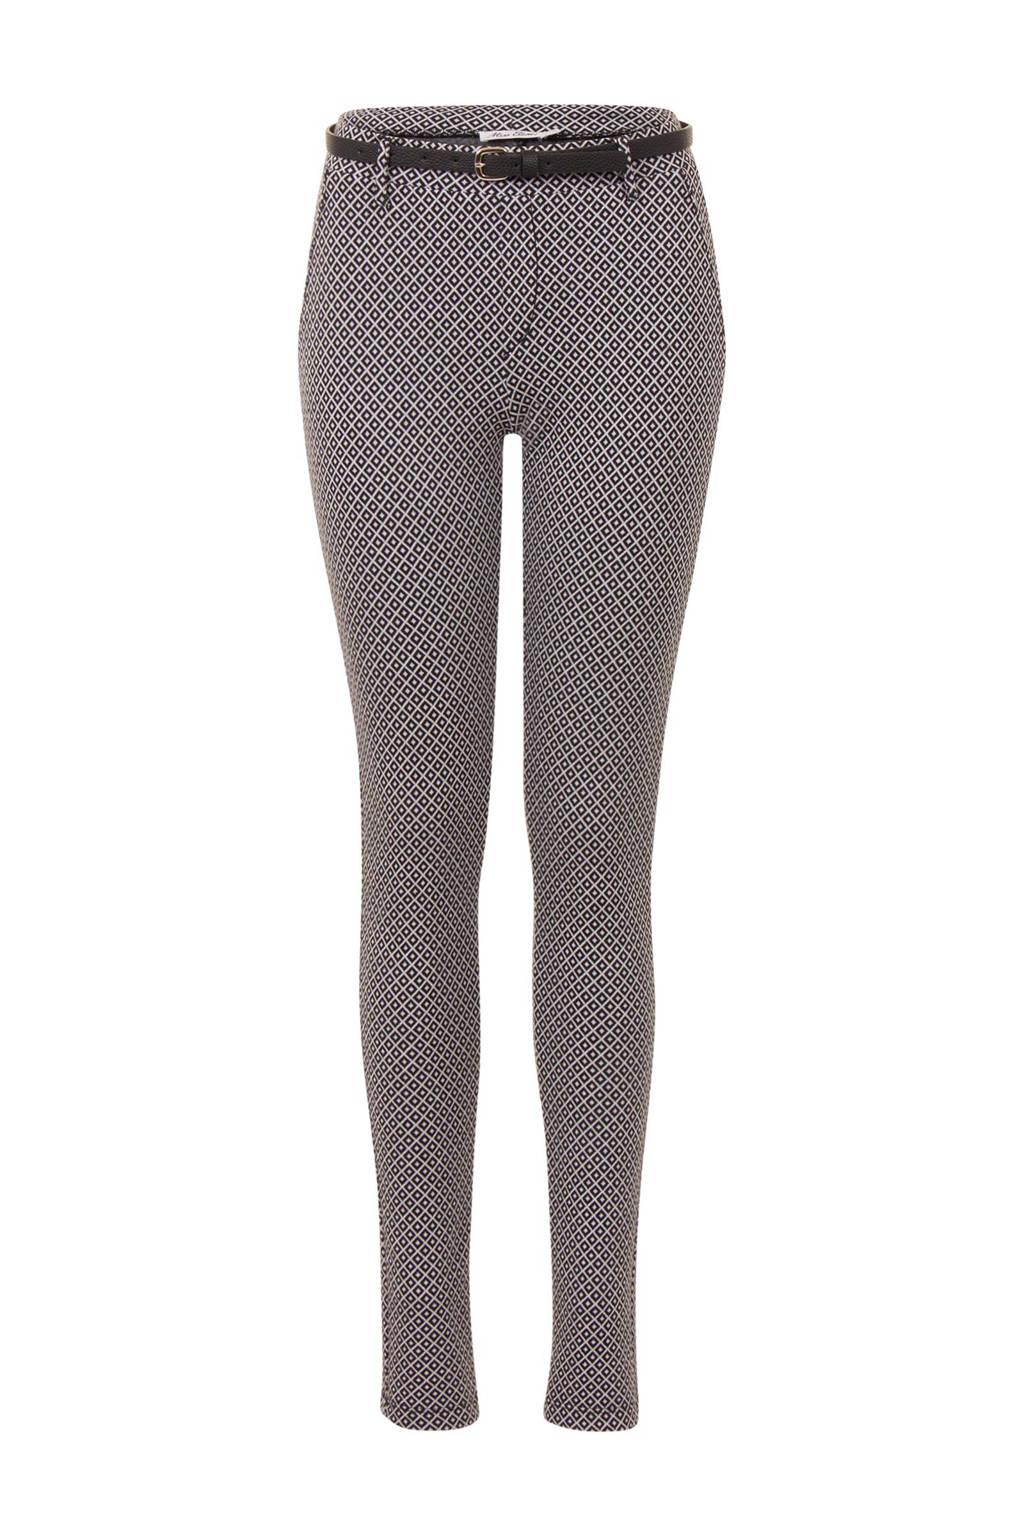 Miss Etam Regulier cropped skinny fit pantalon, Zwart/wit